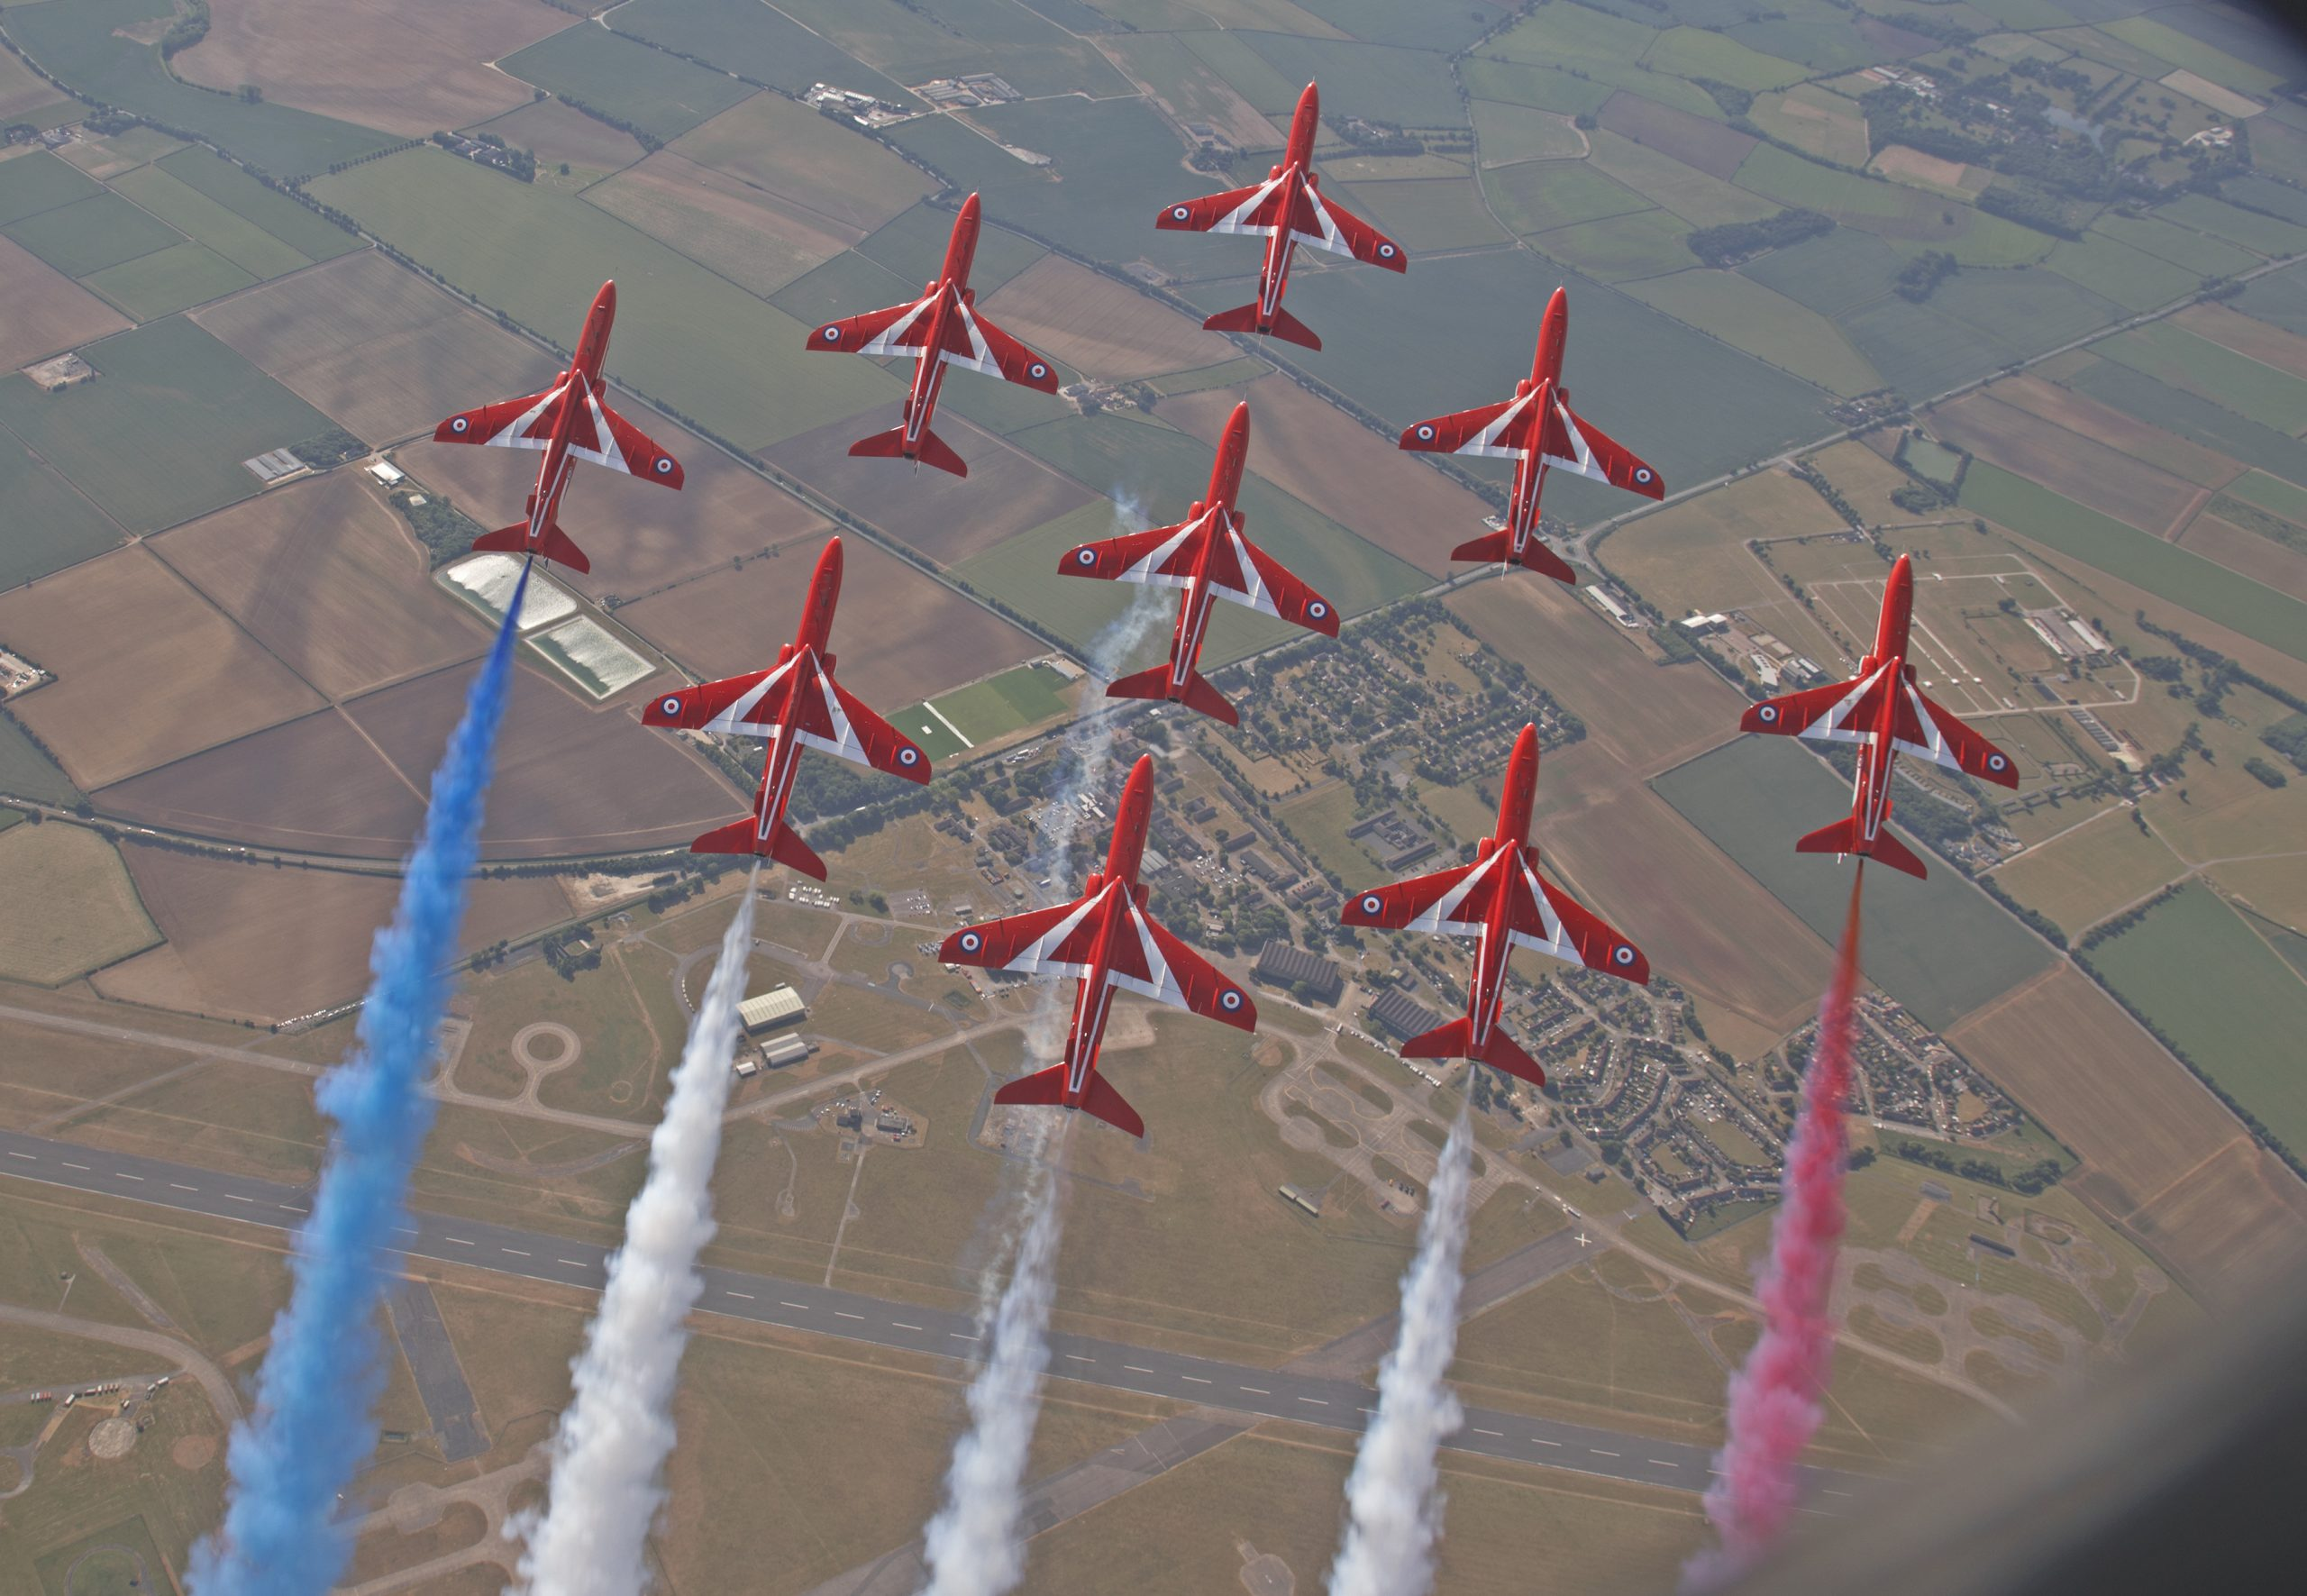 Midlands Air Festival, Red Arrows, Ragley Hall, Alcester